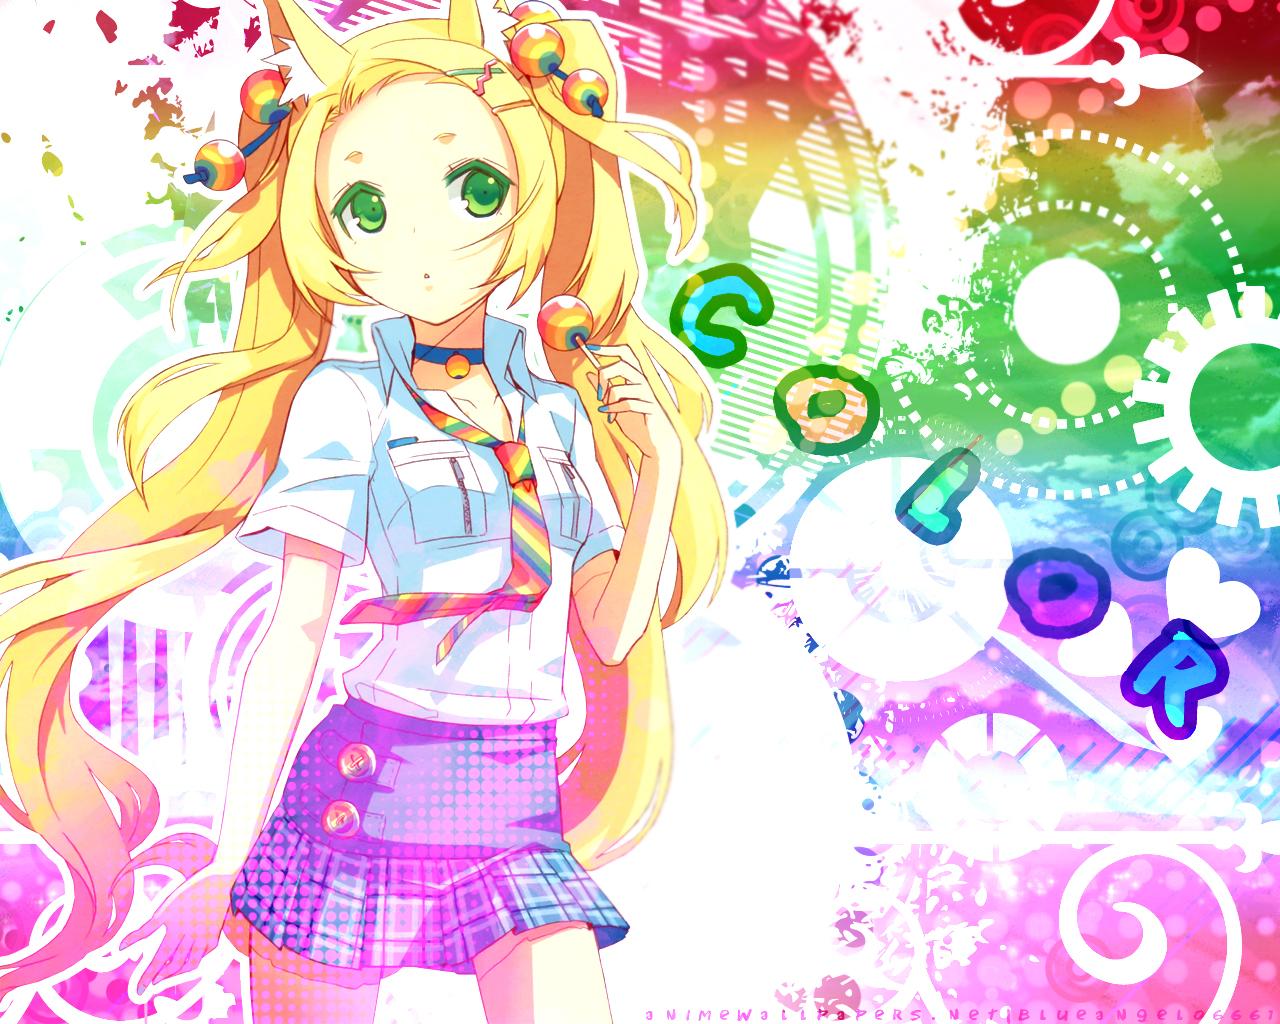 animal_ears blonde_hair candy feathers foxgirl green_eyes h2so4 island_of_horizon lollipop original rainbow tail twintails